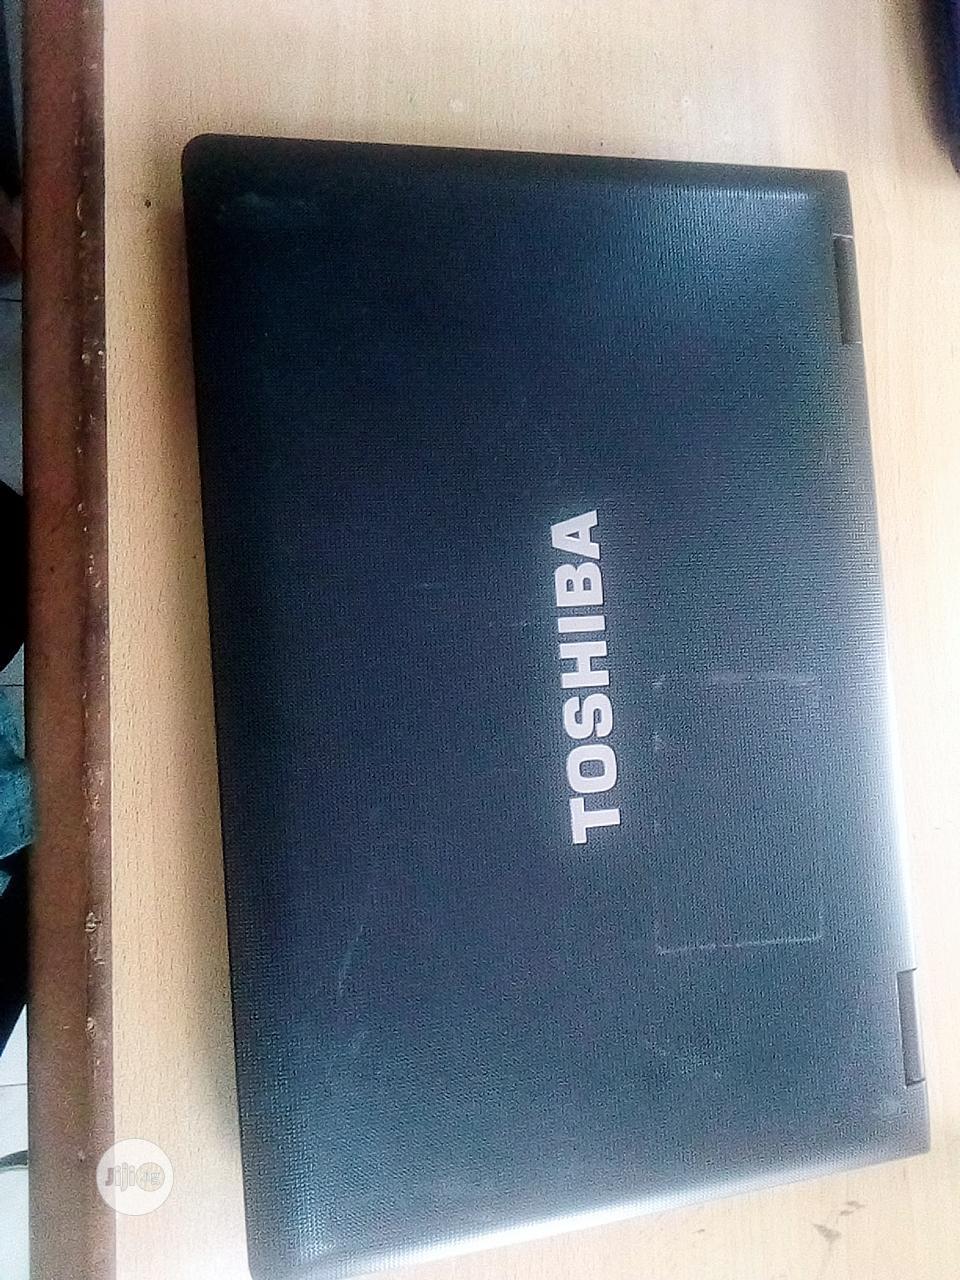 Laptop Toshiba 4GB Intel Core I3 HDD 320GB